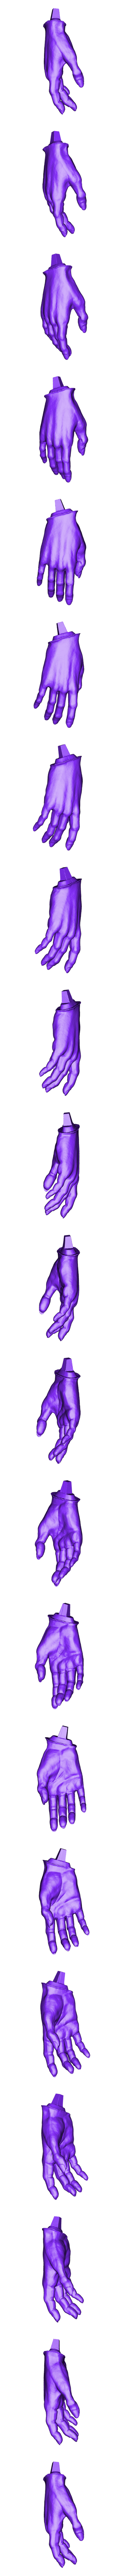 Wrist (repaired).stl Download free STL file Black hunter • 3D printer template, al3x